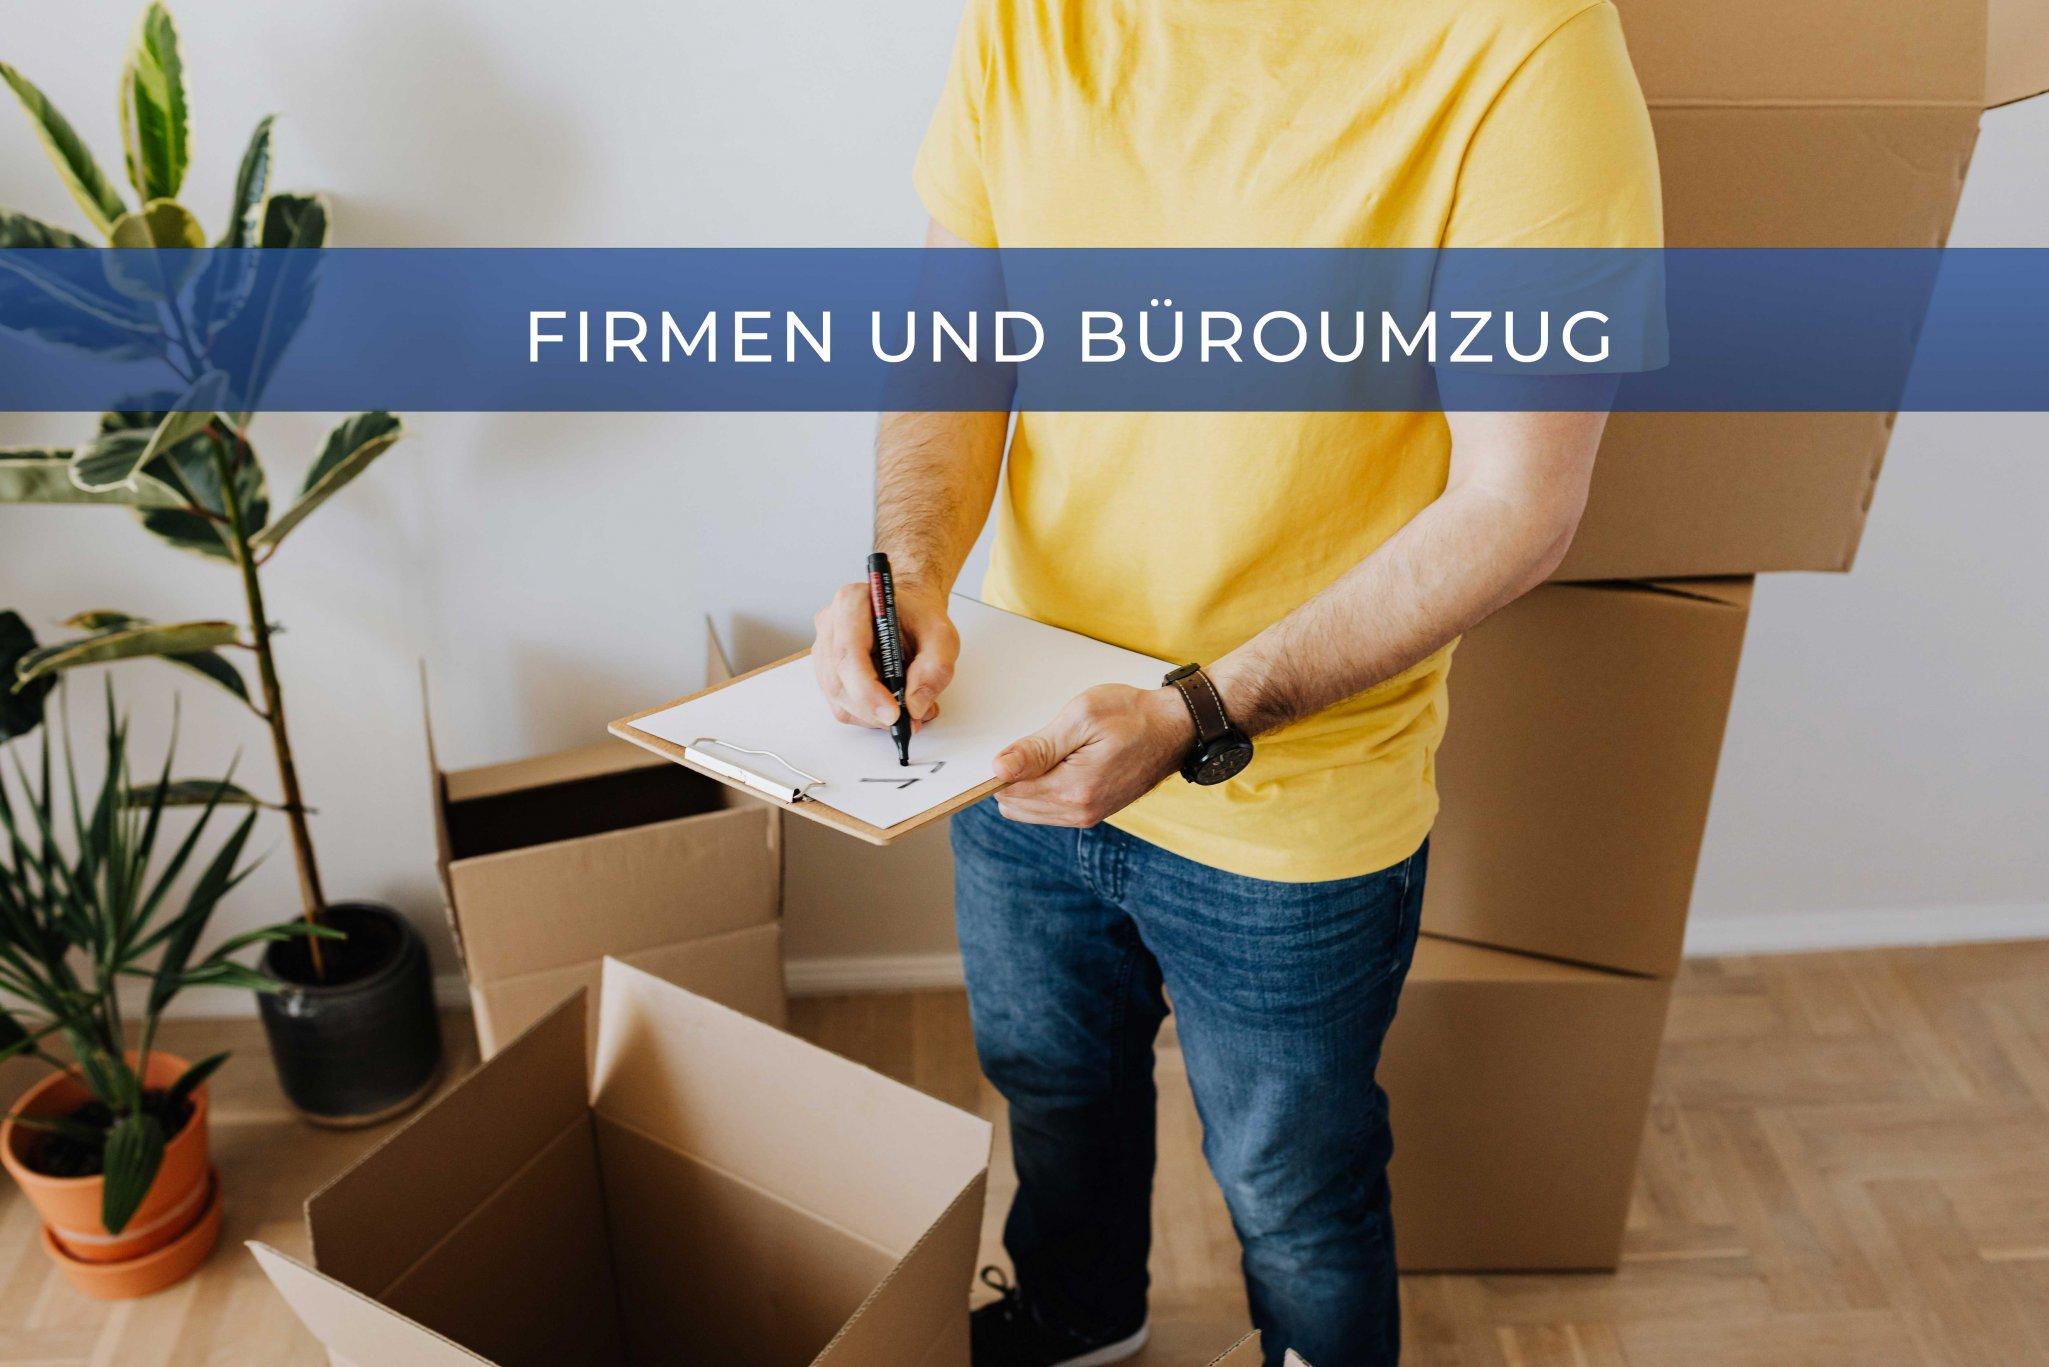 firmen_und_buroumzug__9651a.jpg